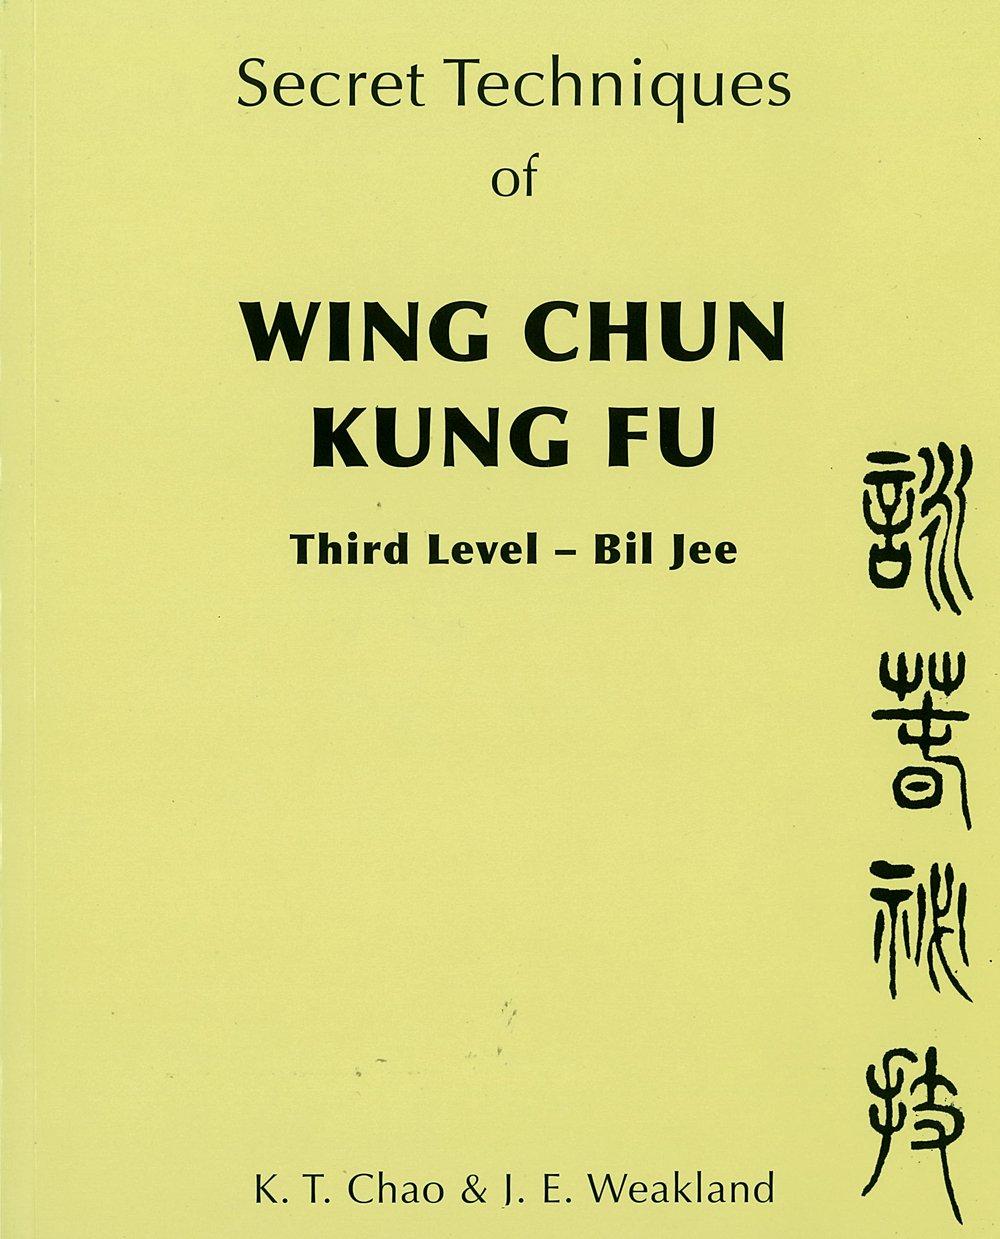 Secret Techniques of Wing Chun Kung Fu: Third Level -- Bil Jee: K. T. Chao,  John Weakland: 9780901764621: Amazon.com: Books